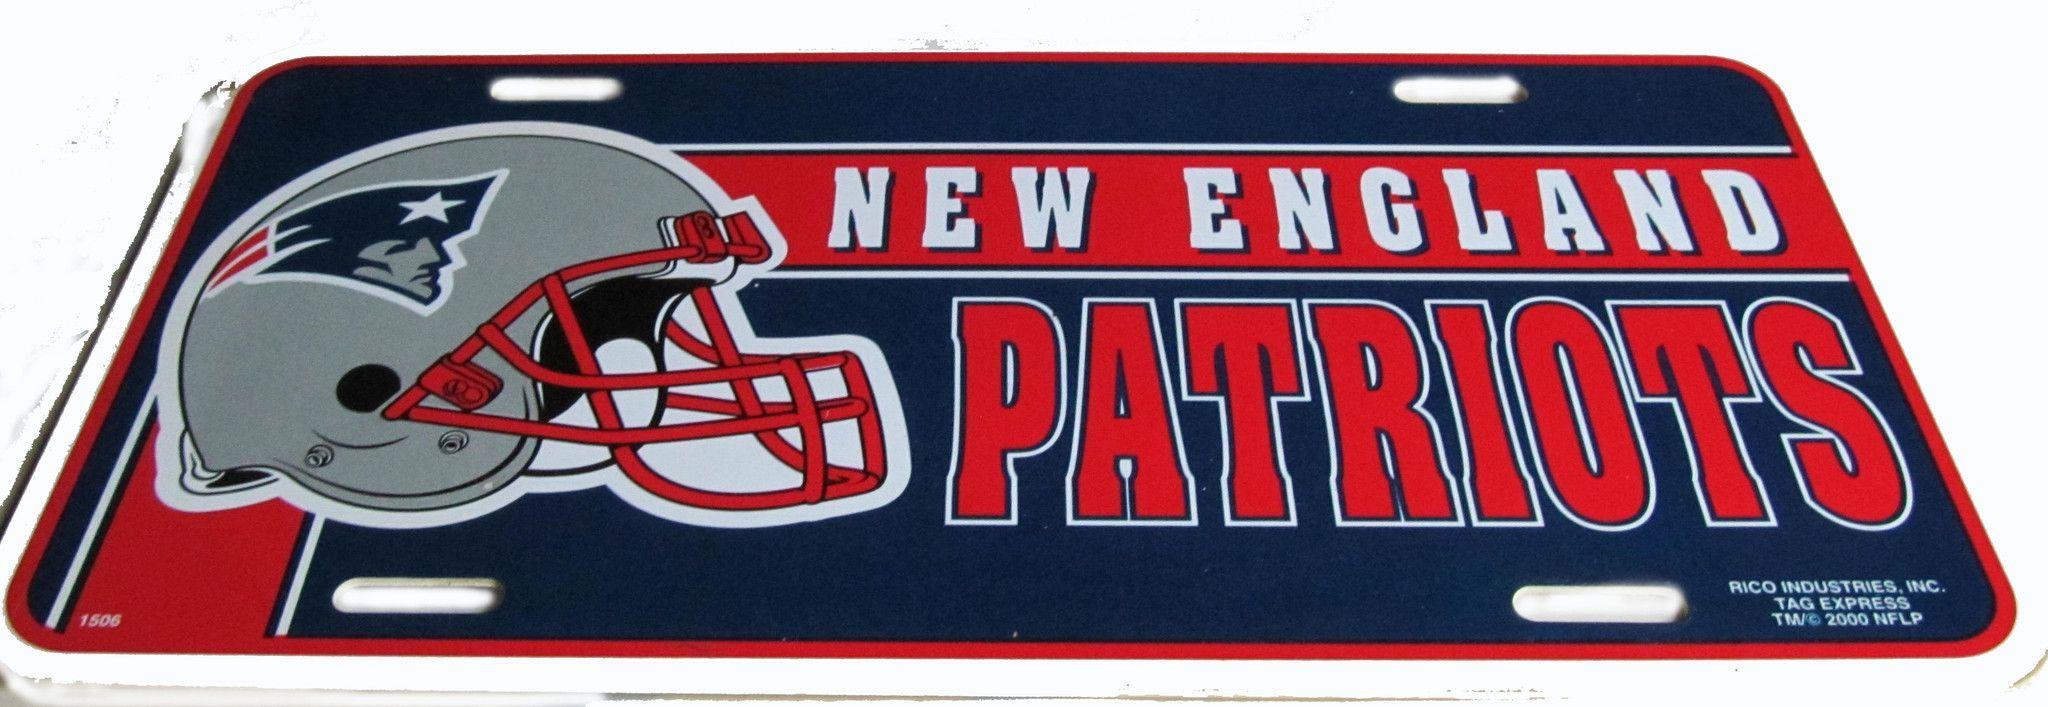 New england patriots license plate patriots new england